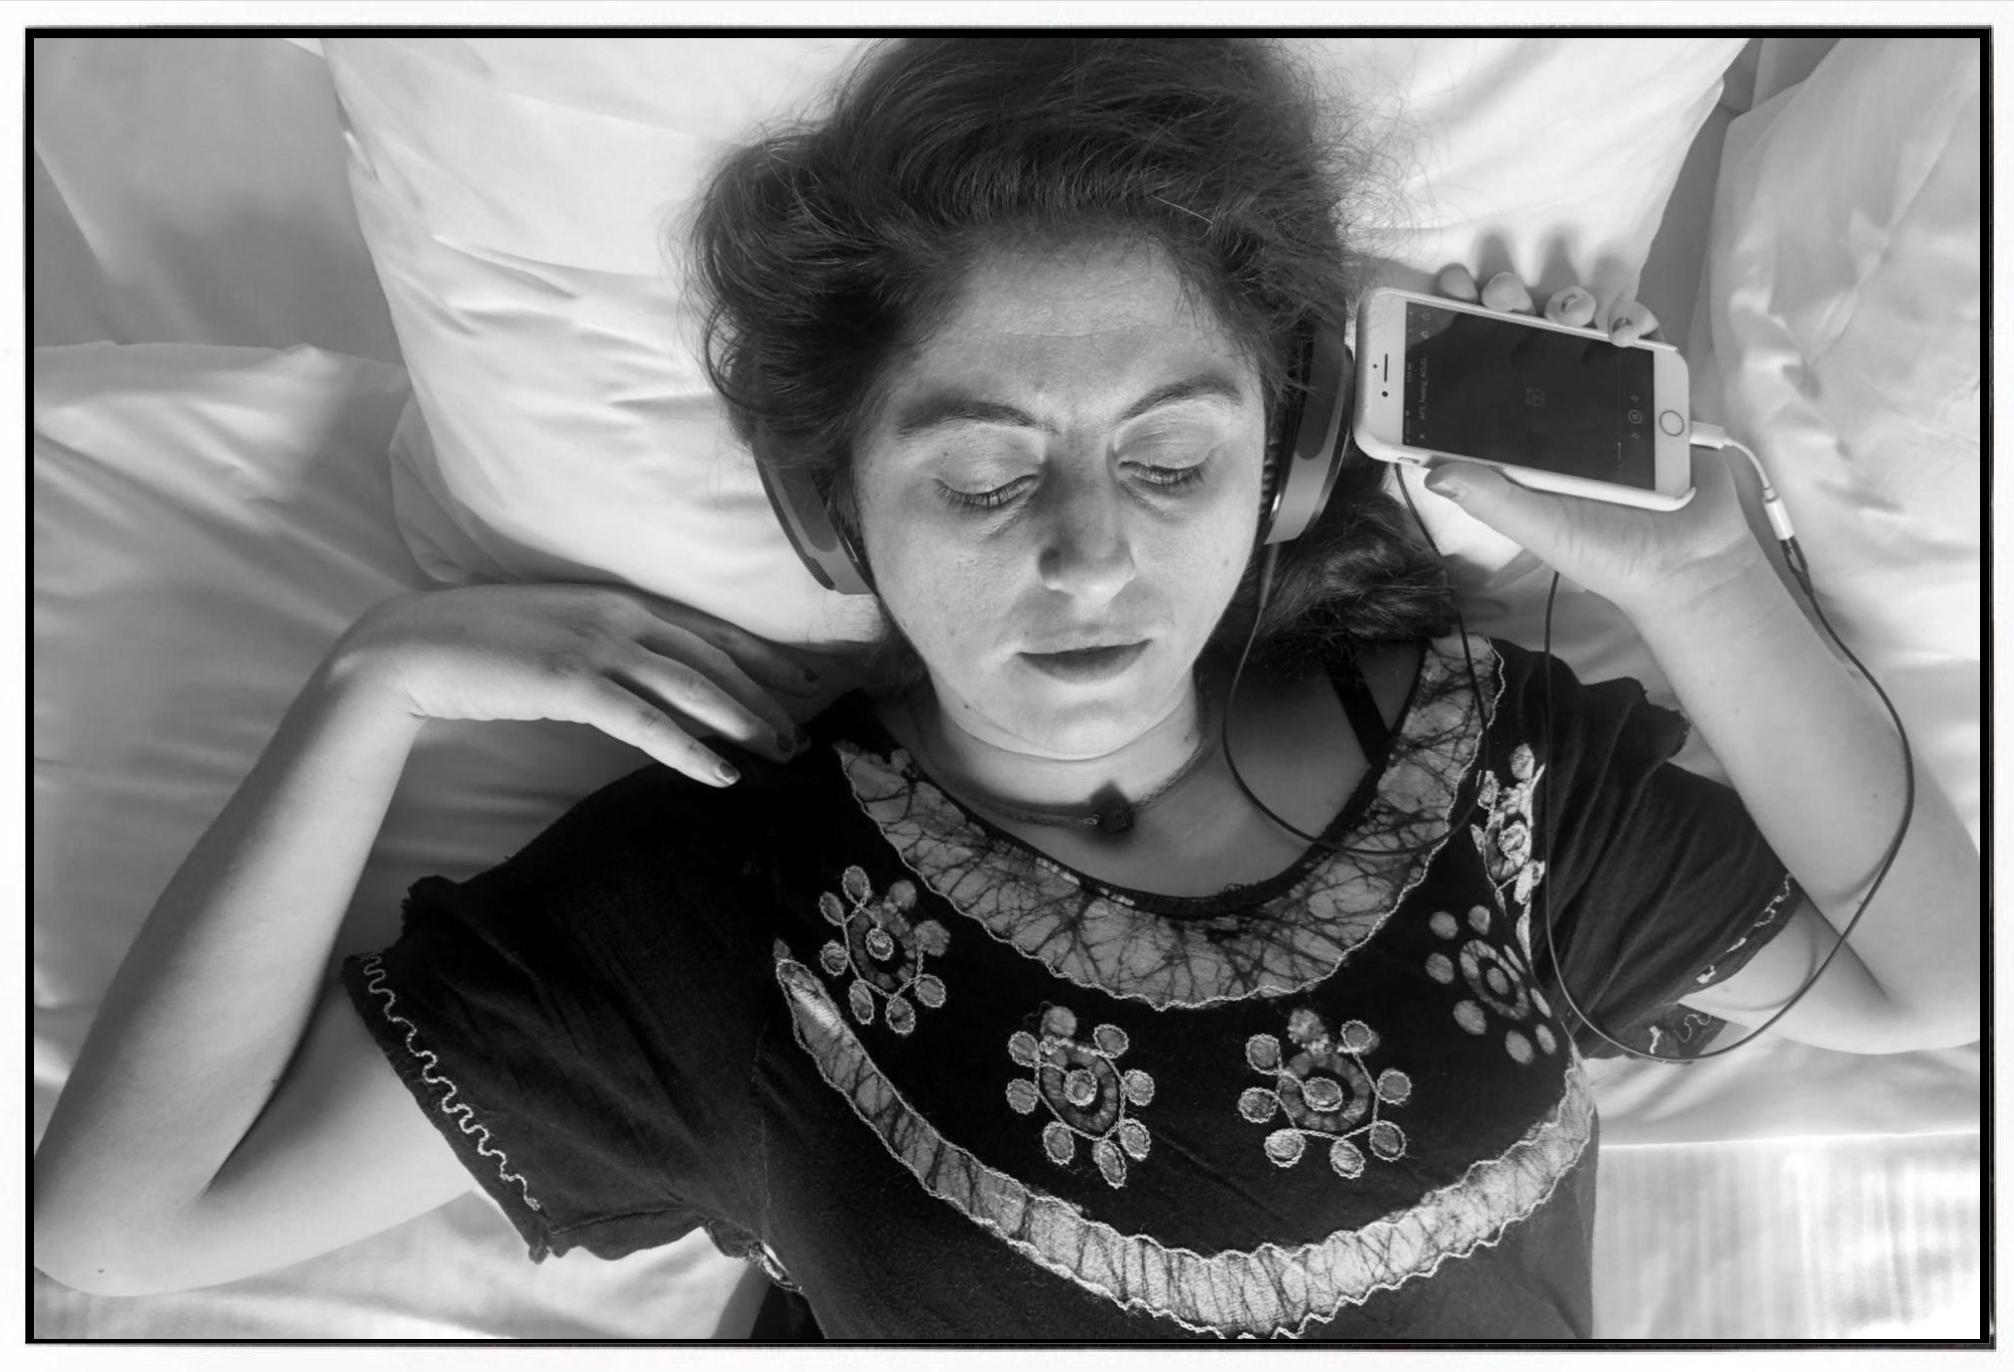 the bed whisperers, sharon mashihi, monique laborde, jen ng, wythe hotel, on air fest, sophie calle, les dormeurs